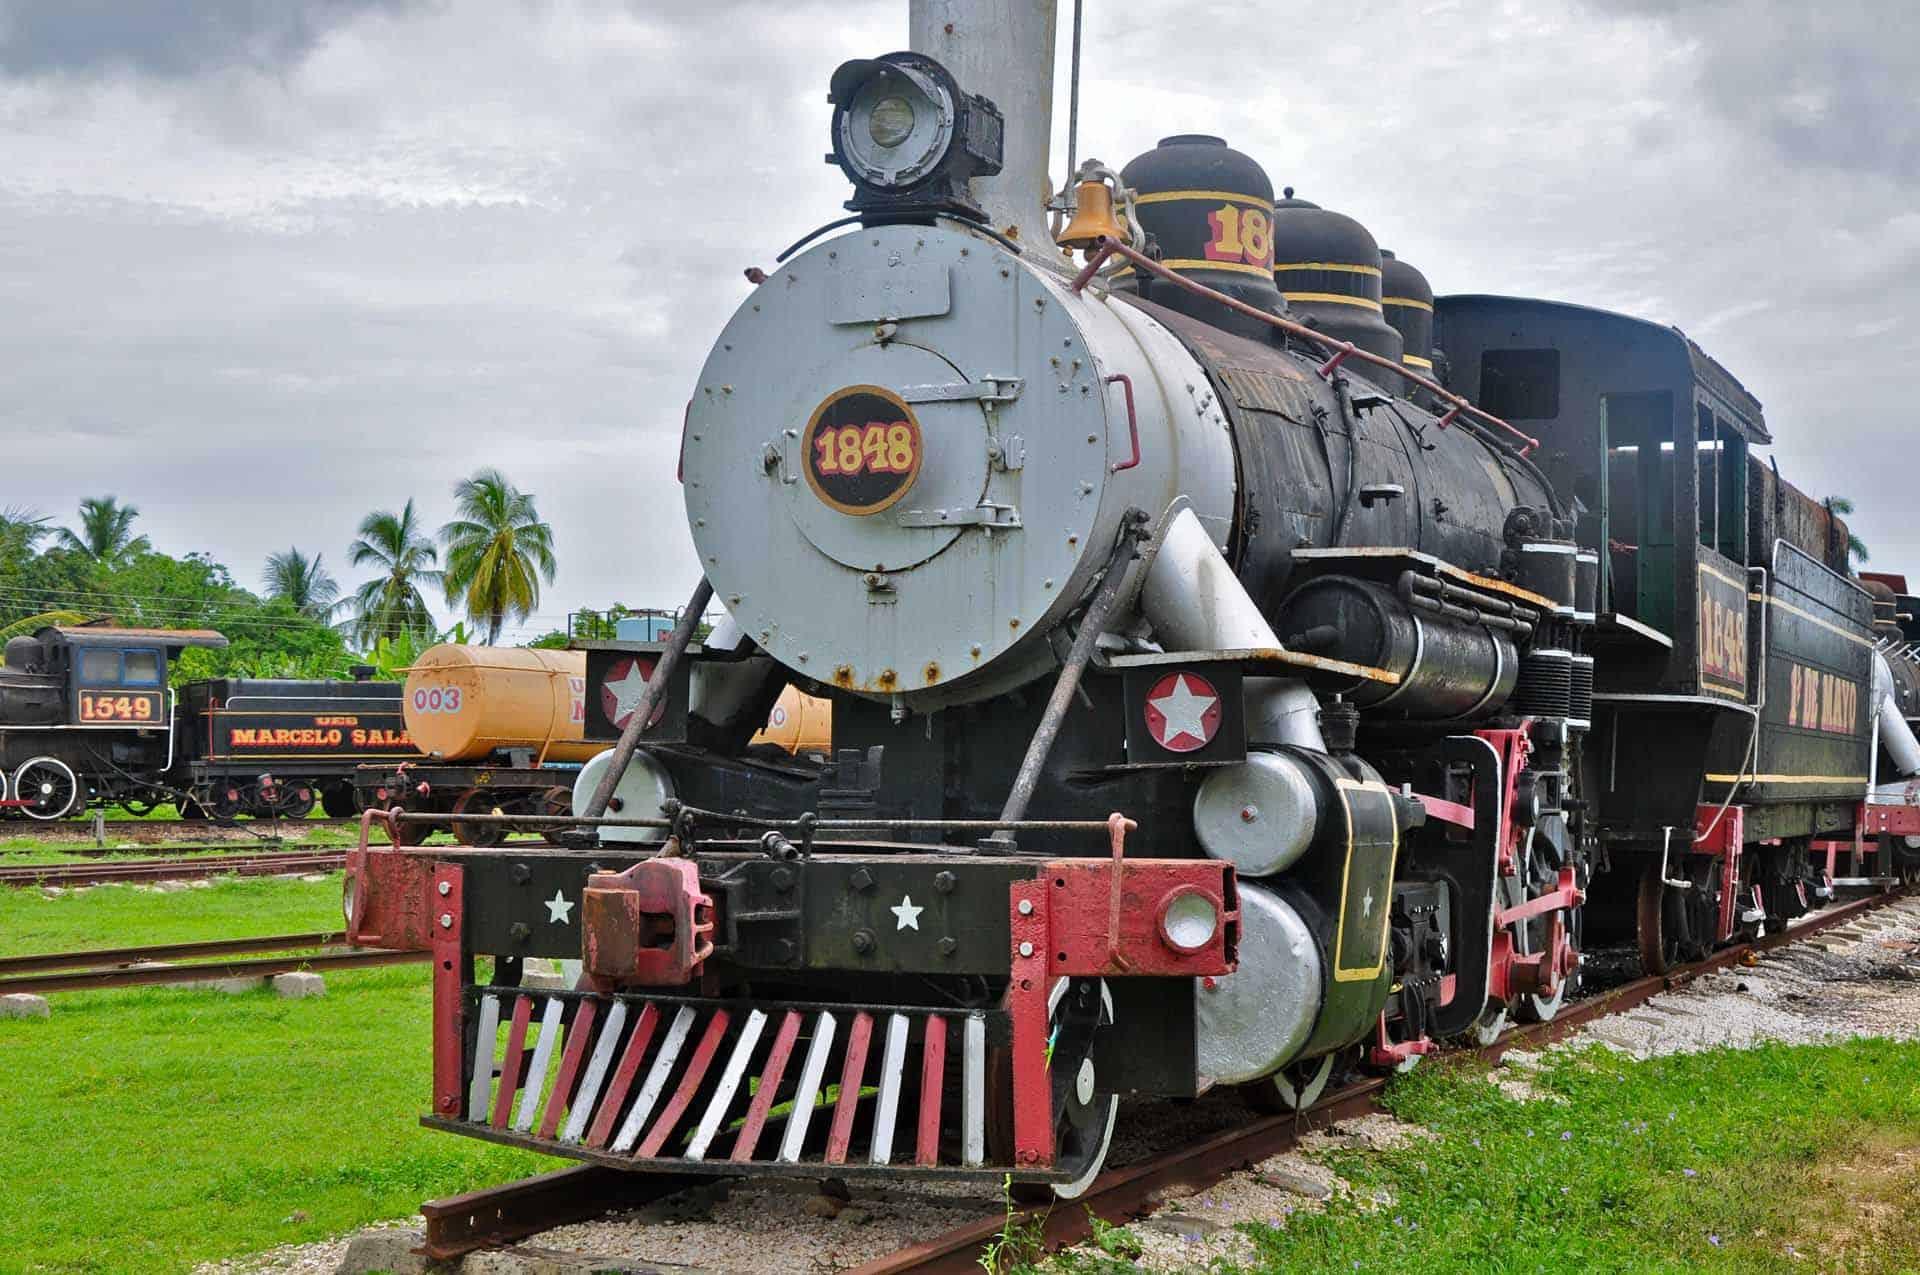 remedios musee agro industrie ancienne sucrerie locomotive cuba autrement